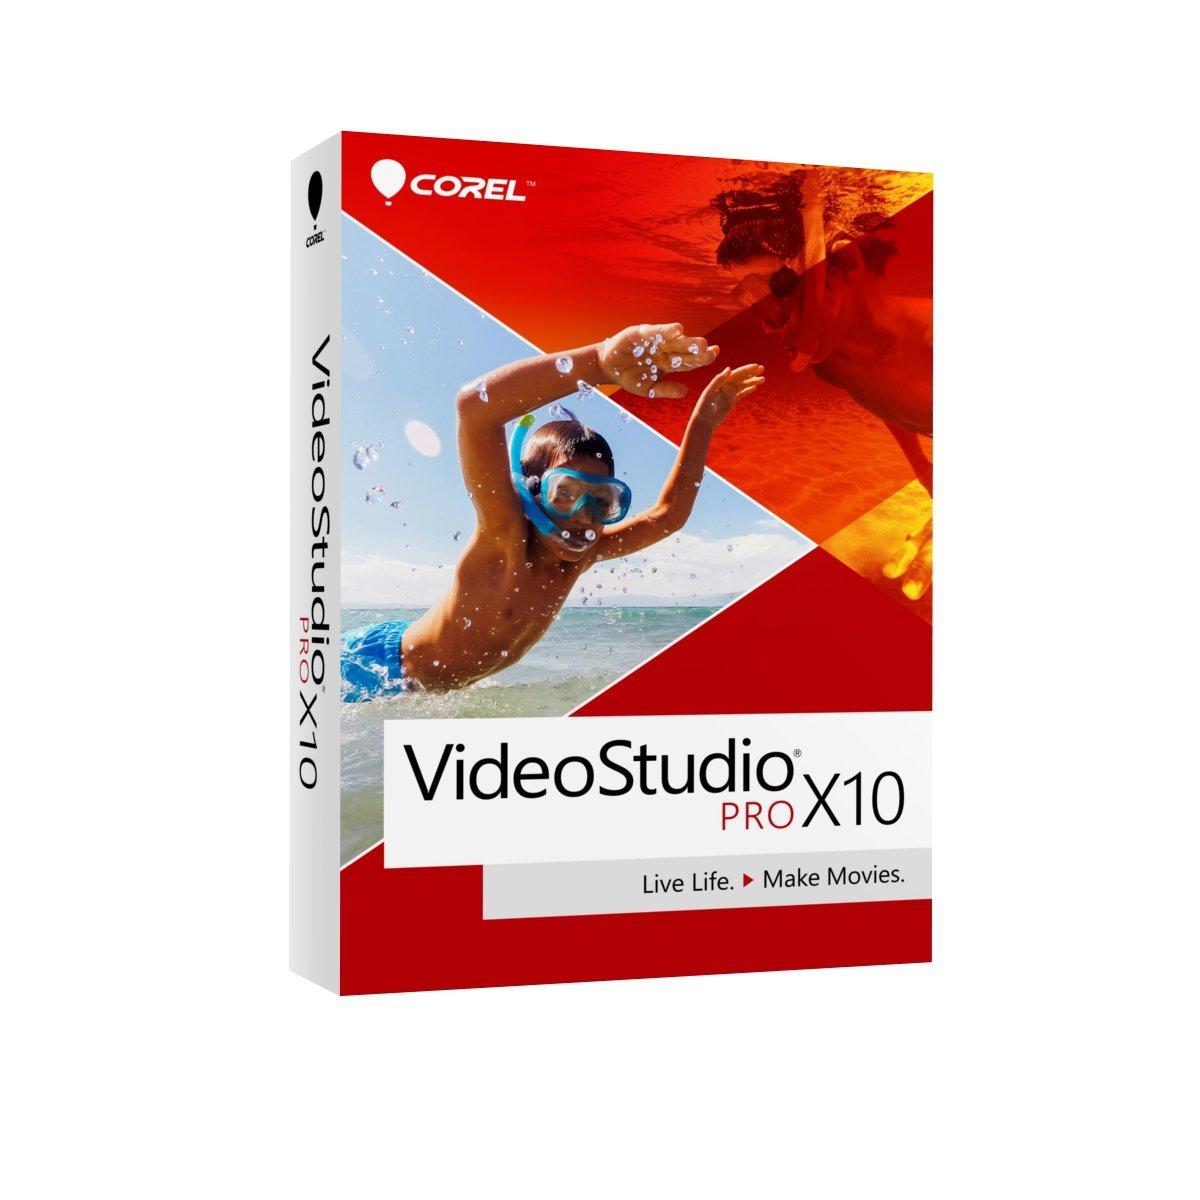 Corel VideoStudio Pro X10 Video Editing Suite for PC